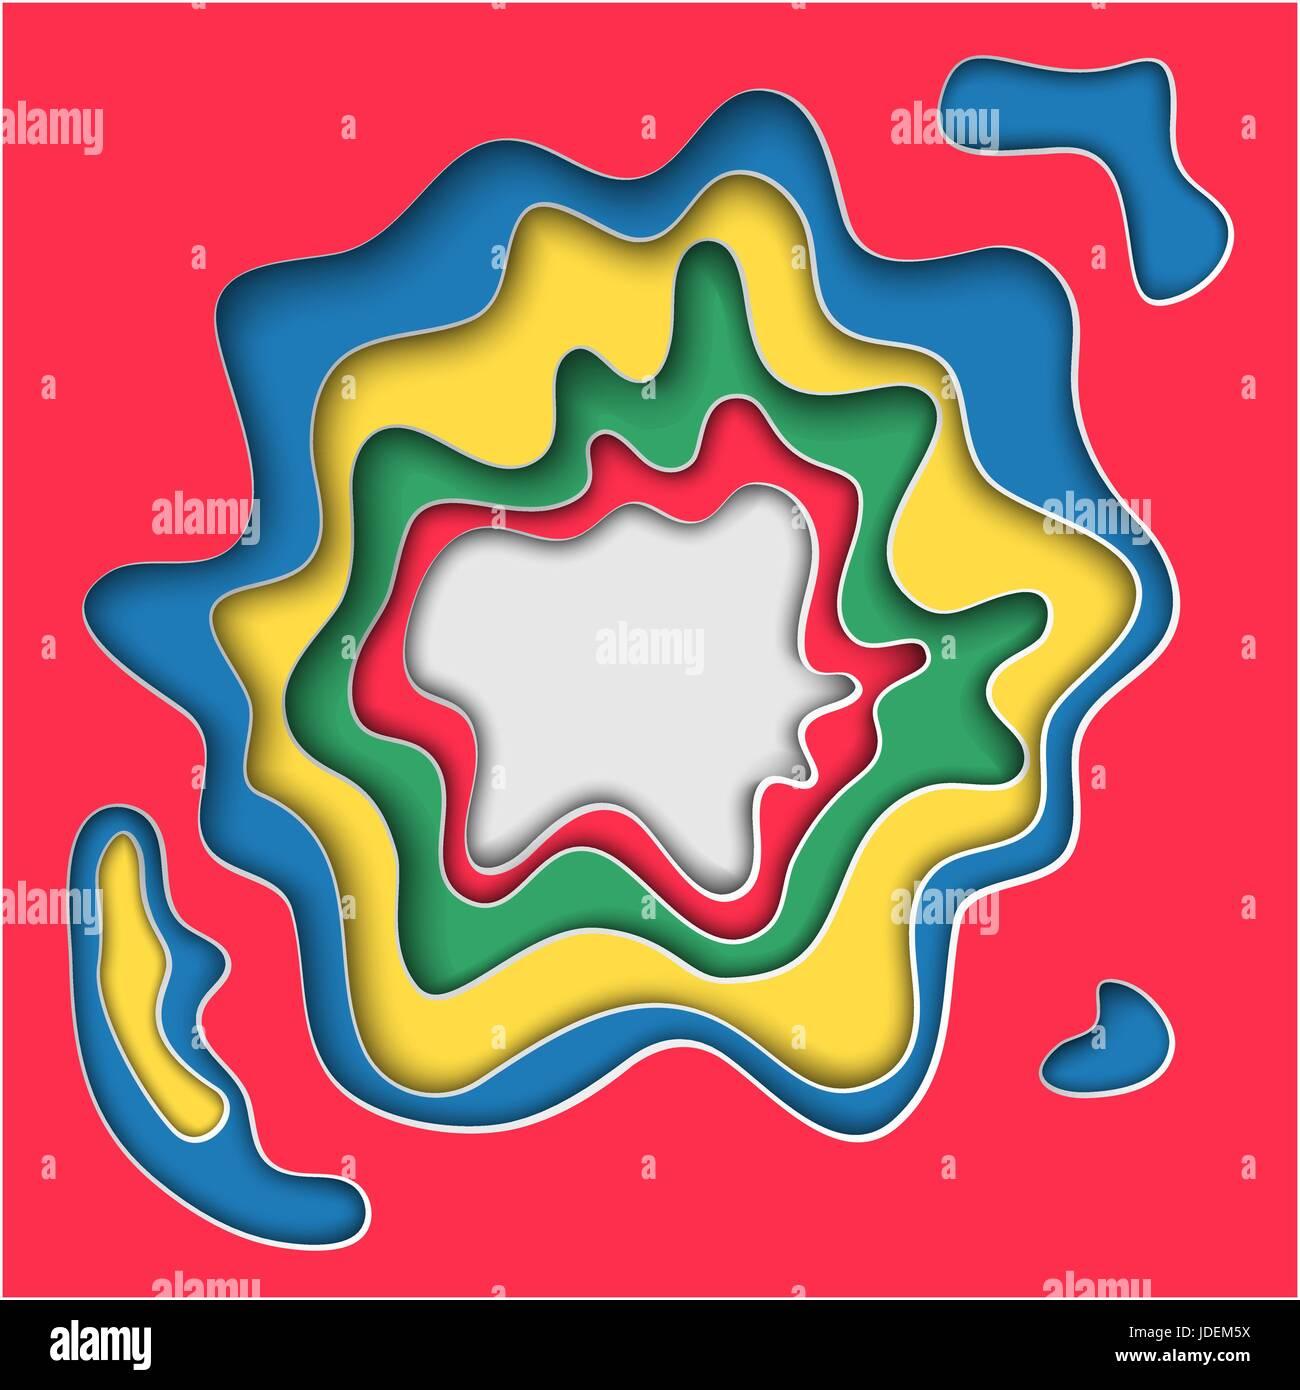 Vector Illustration Of Pop Up Book For Design Website Background Banner Paper Origami Elements Craft Template